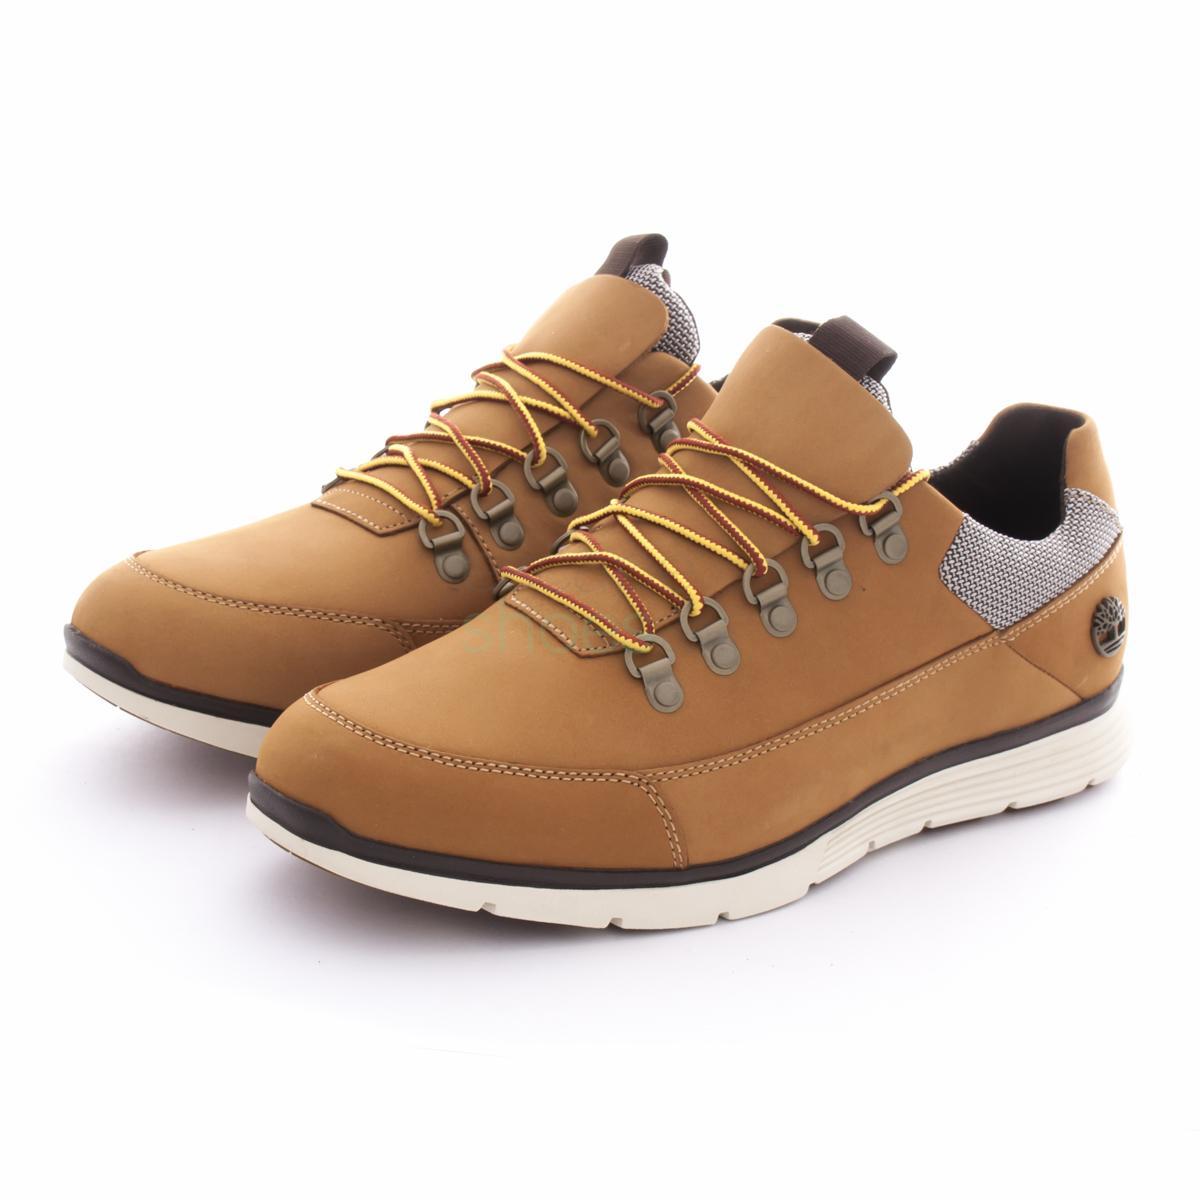 d513830c1da Buy your Shoes TIMBERLAND Killington Hiker Oxford Wheat A1JIP here ...